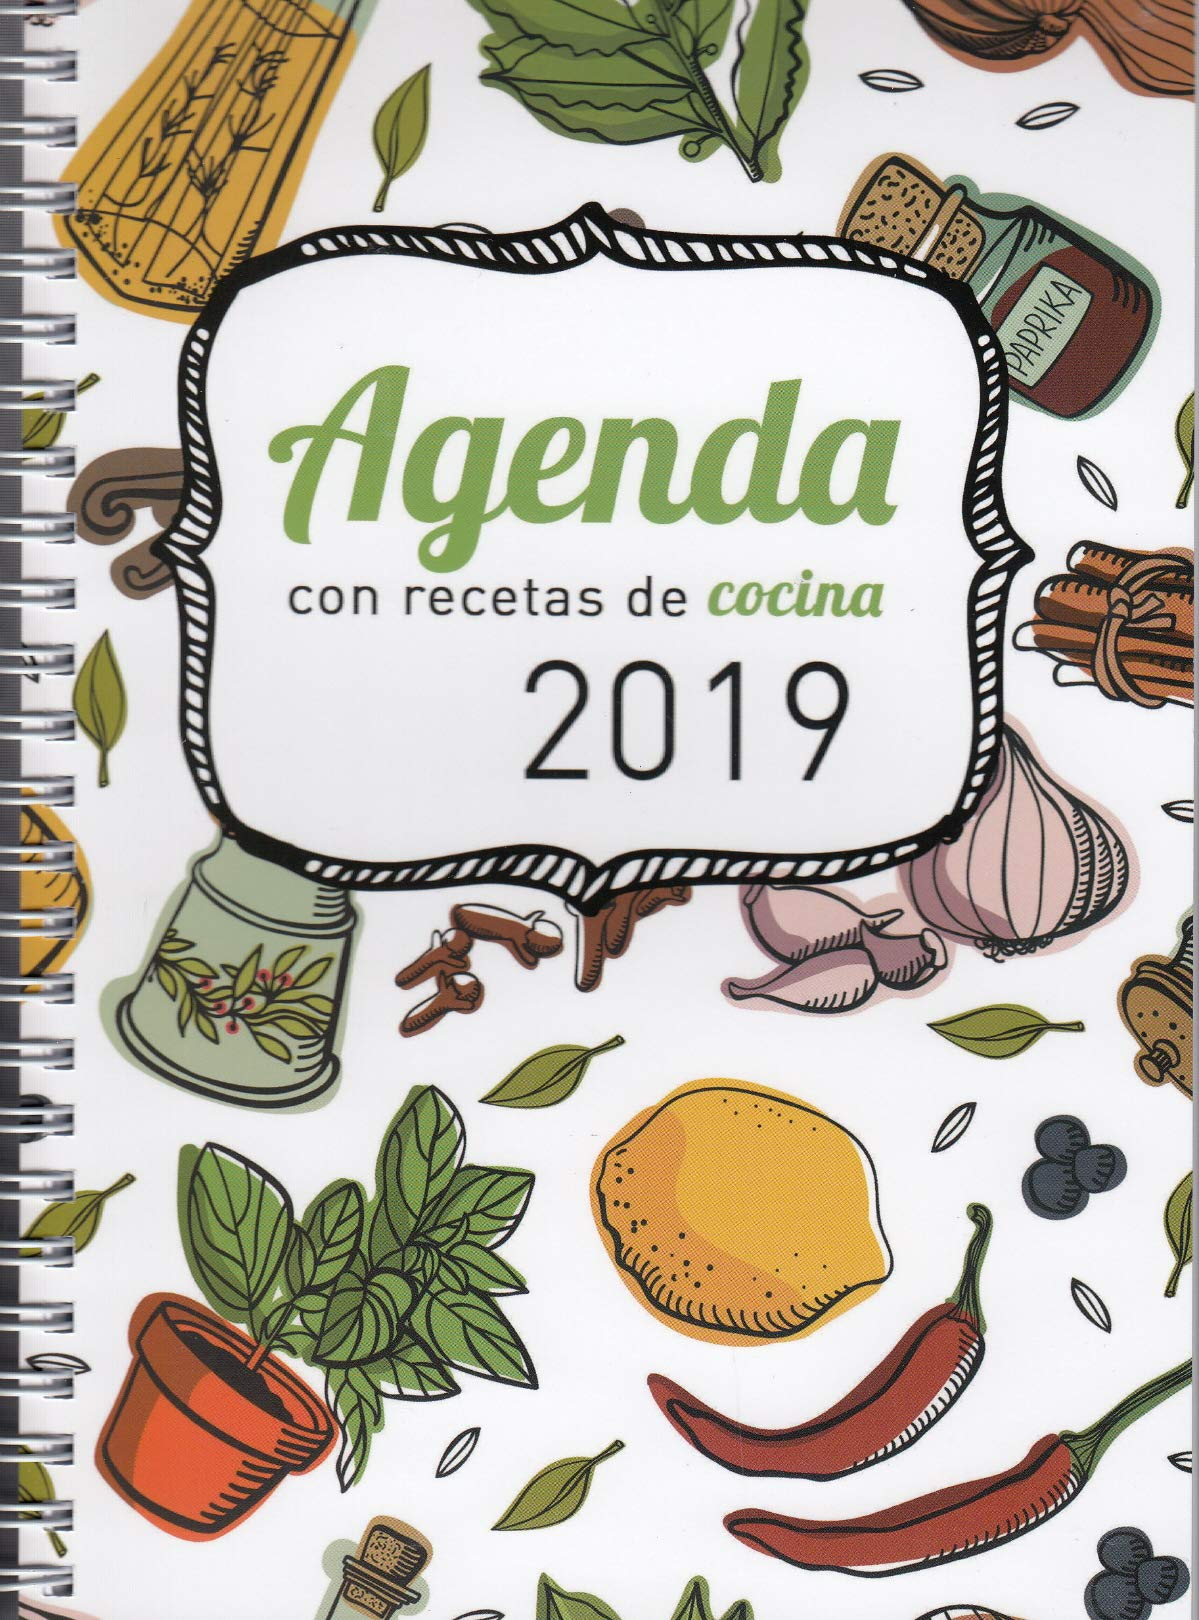 Agenda 2019 con recetas de cocina Tapa blanda – 11 sep 2018 Ediciones Mensajero 8427141602 WBA Basteln / Handarbeiten